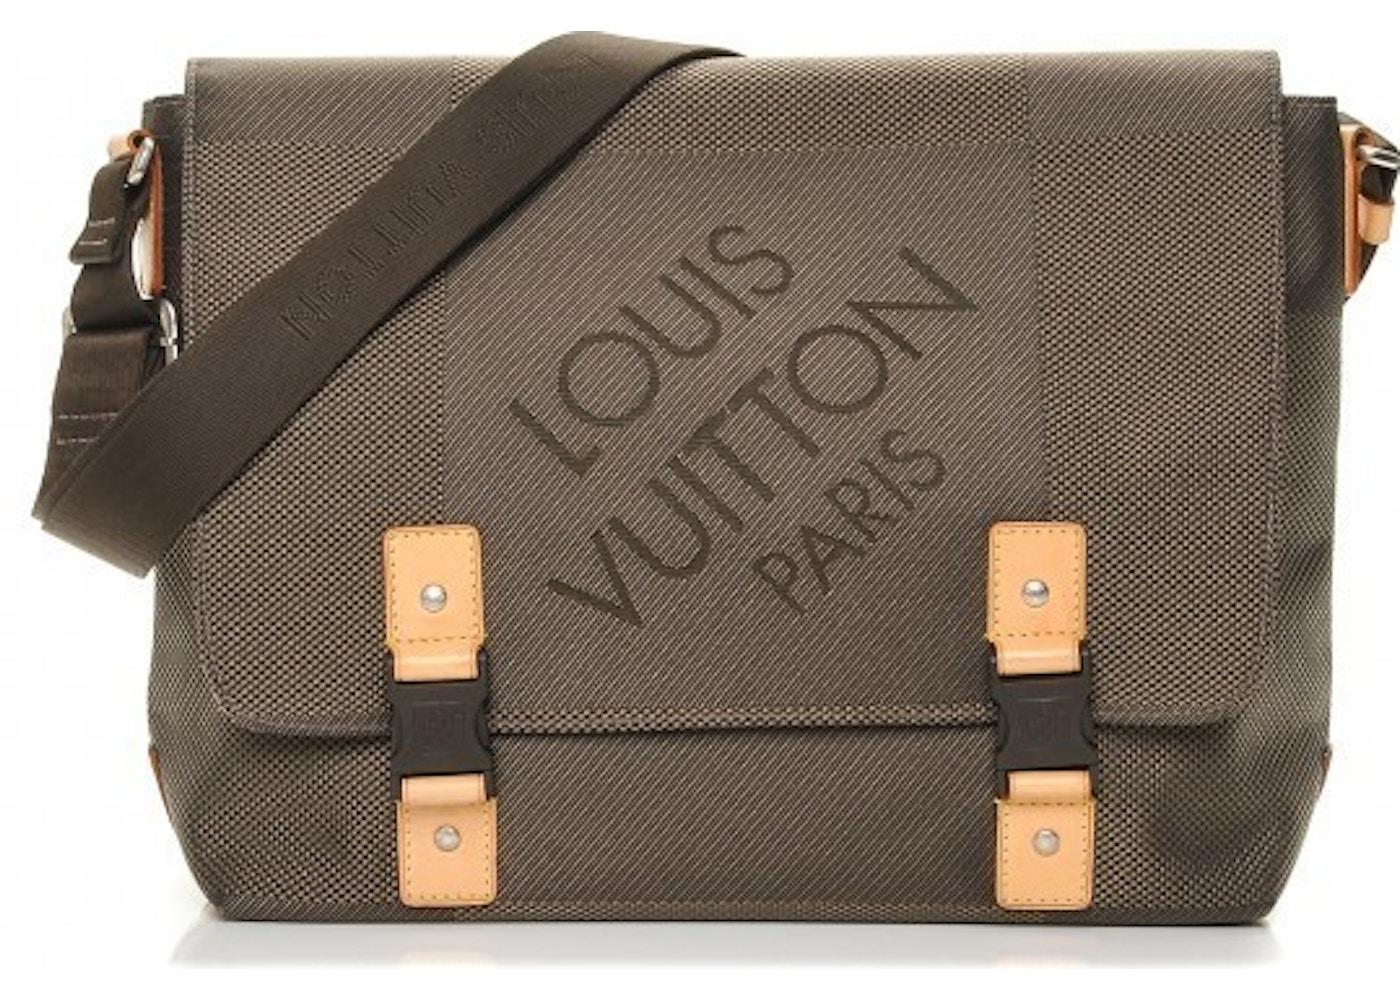 ... Louis Vuitton Messenger Bag Damier Geant Brown. Damier Geant Brown Louis  Vuitton Citadin ... 59296efdafe42